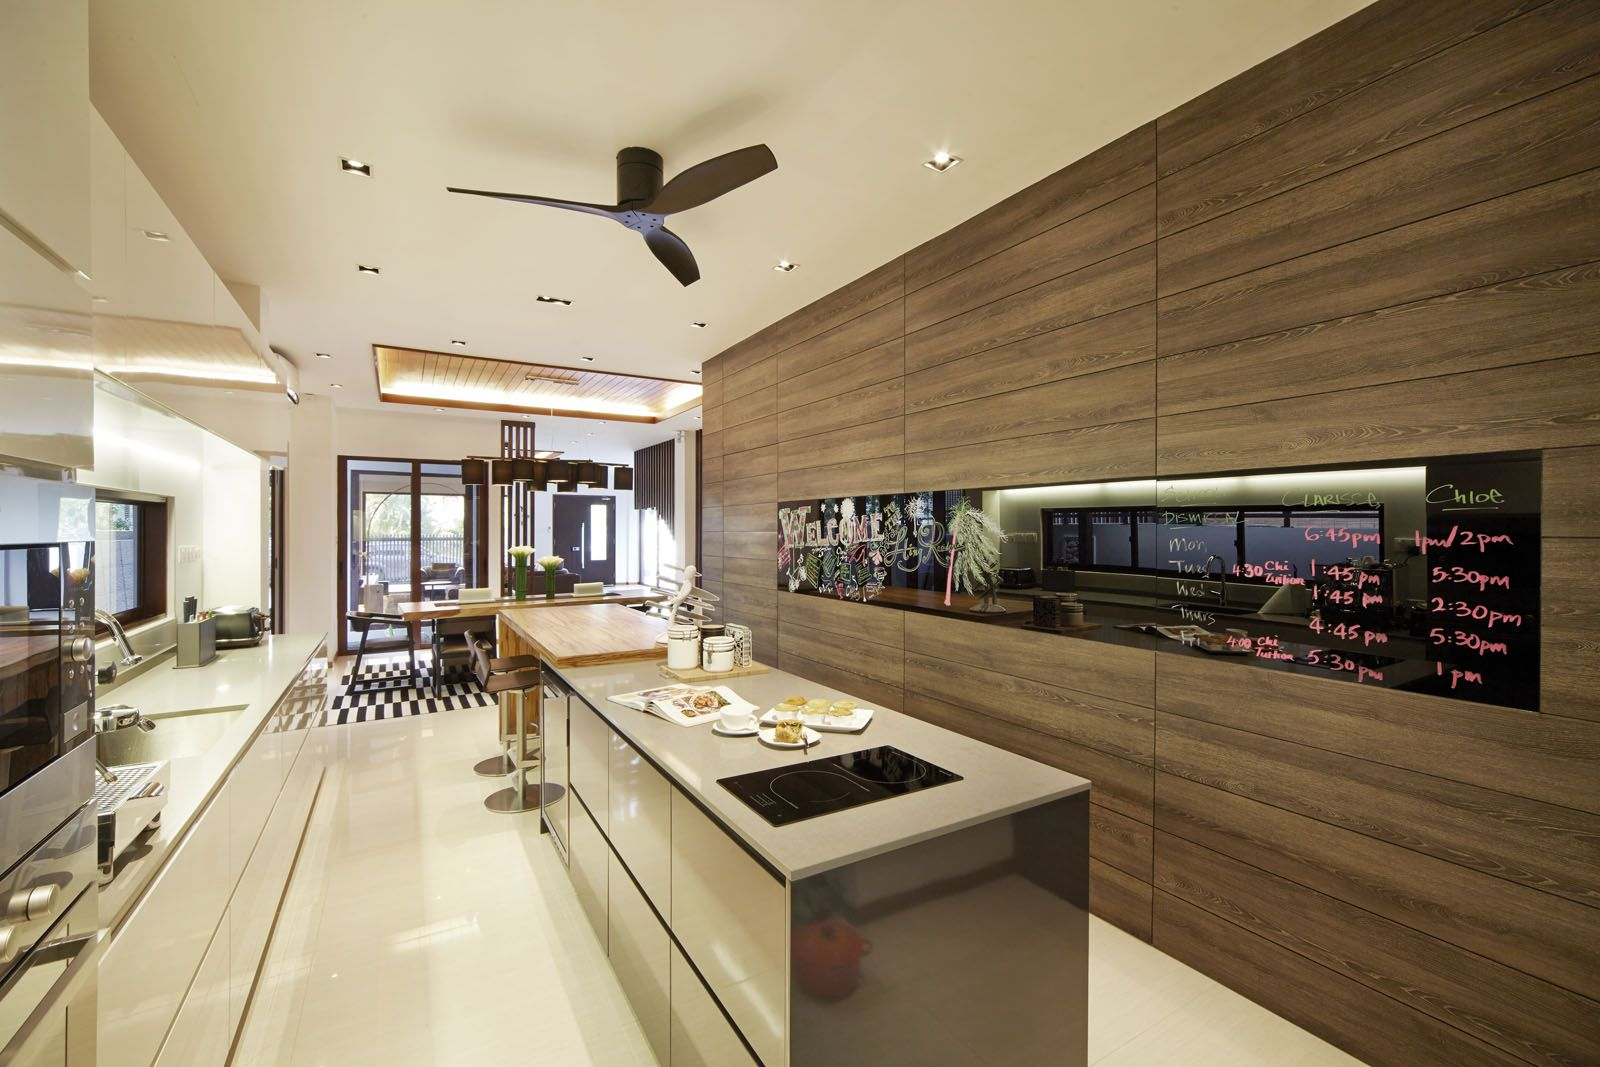 A matte black Signature series fan floats above a modern kitchen designed by KGID